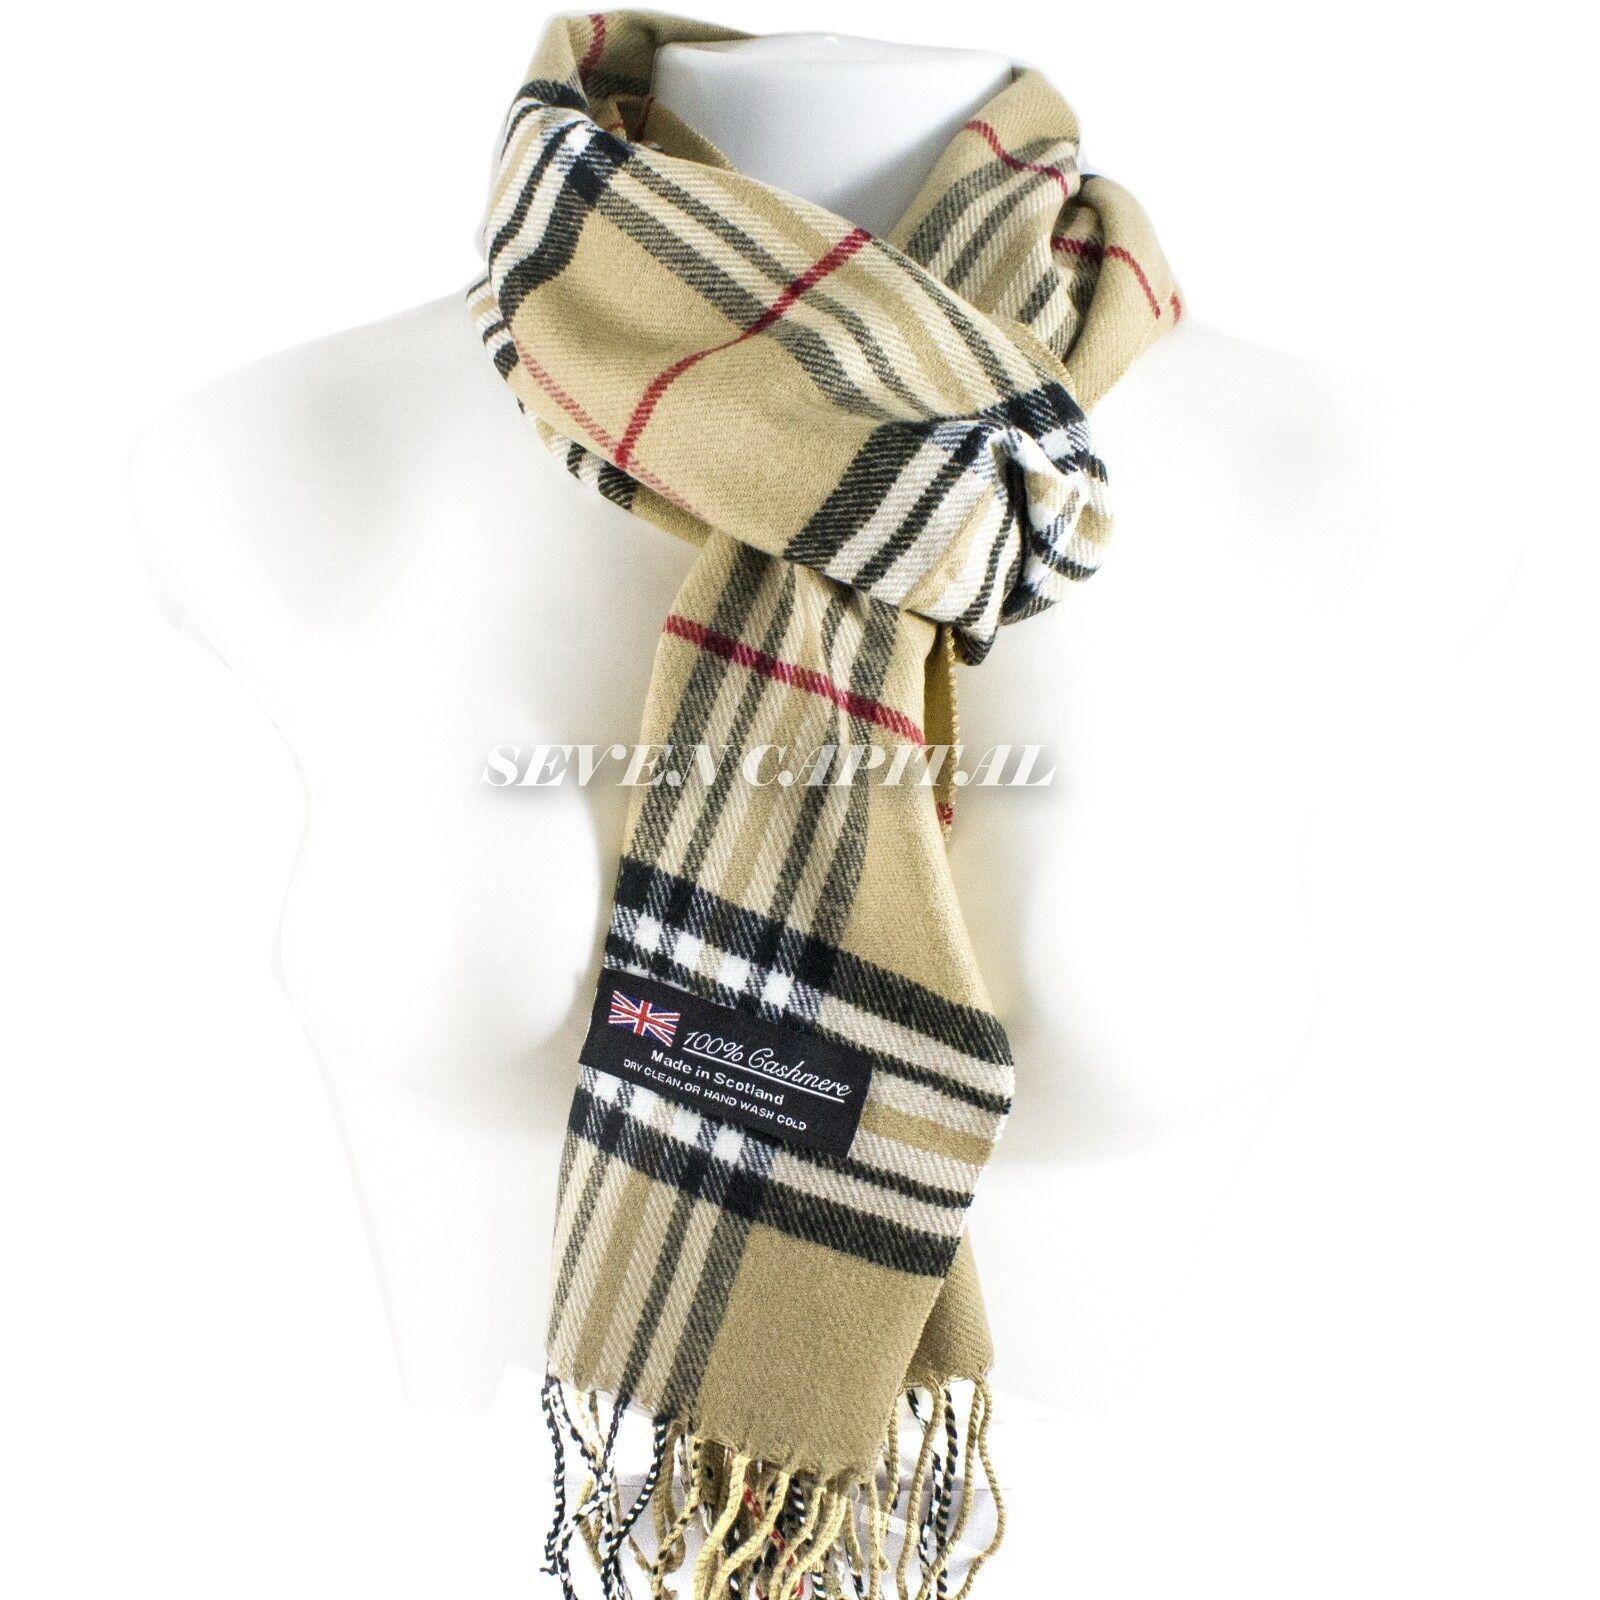 Mens Womens Winter Warm SCOTLAND Made 100% CASHMERE Scarf Scarves Plaid Wool 8. Plaid: Beige/White/Black